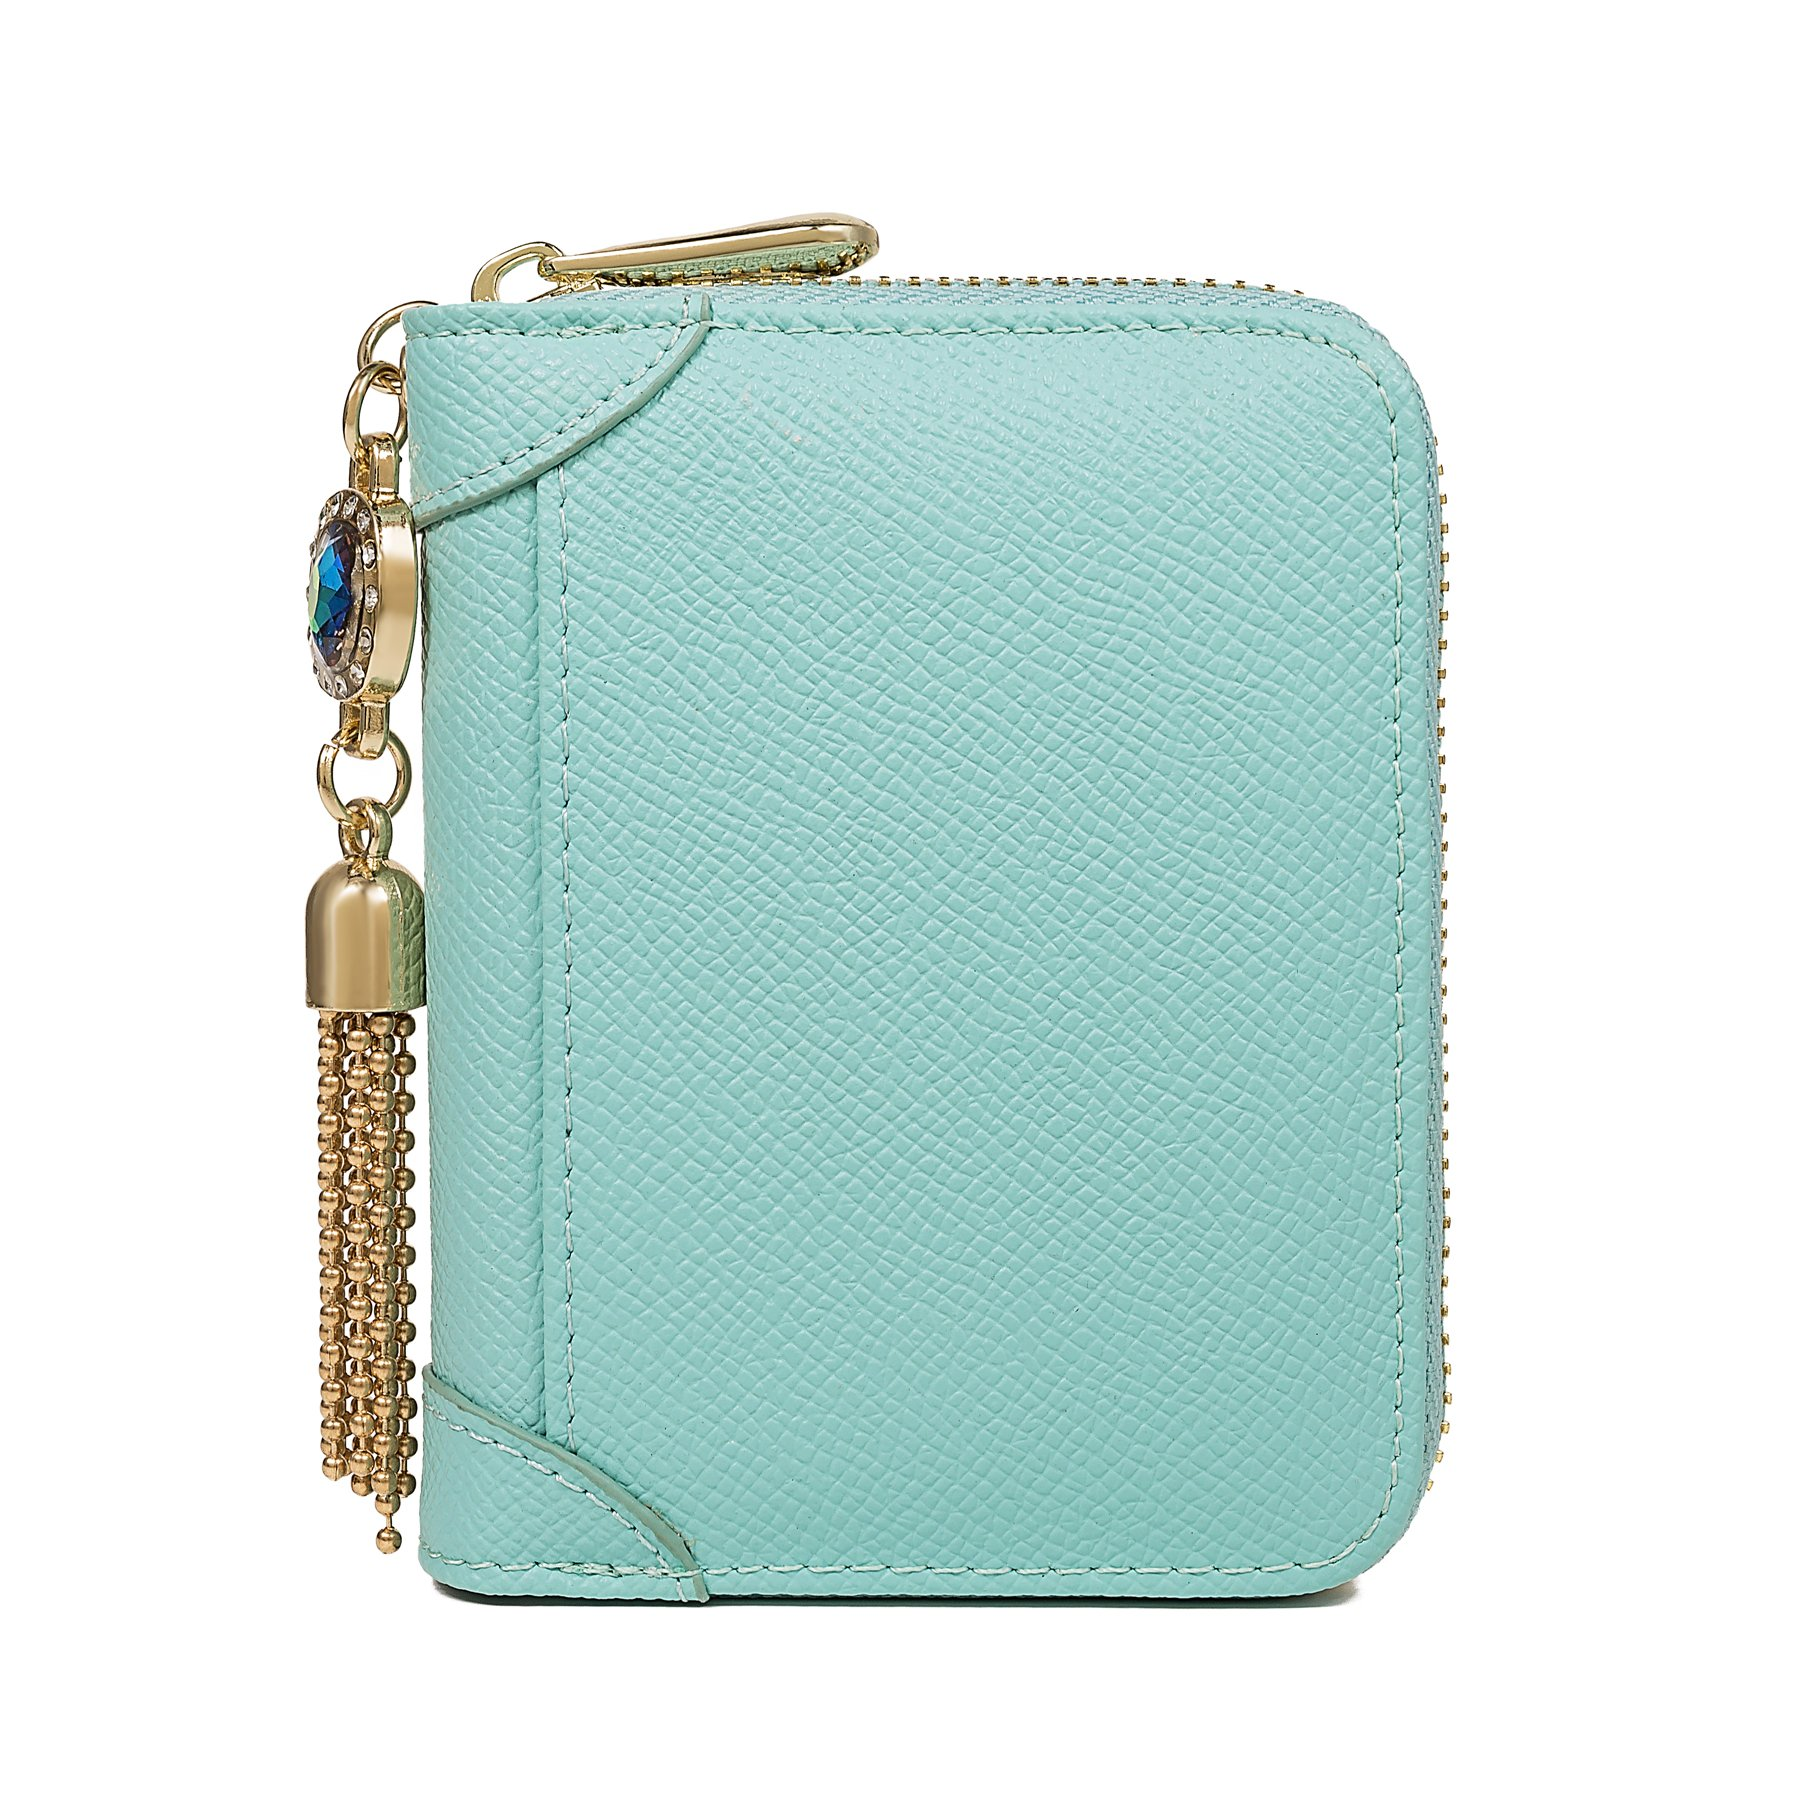 SafeCard Women's Credit Card Case Wallet 2 ID Window and Zipper Card Holder Purse (Blue Jewel)